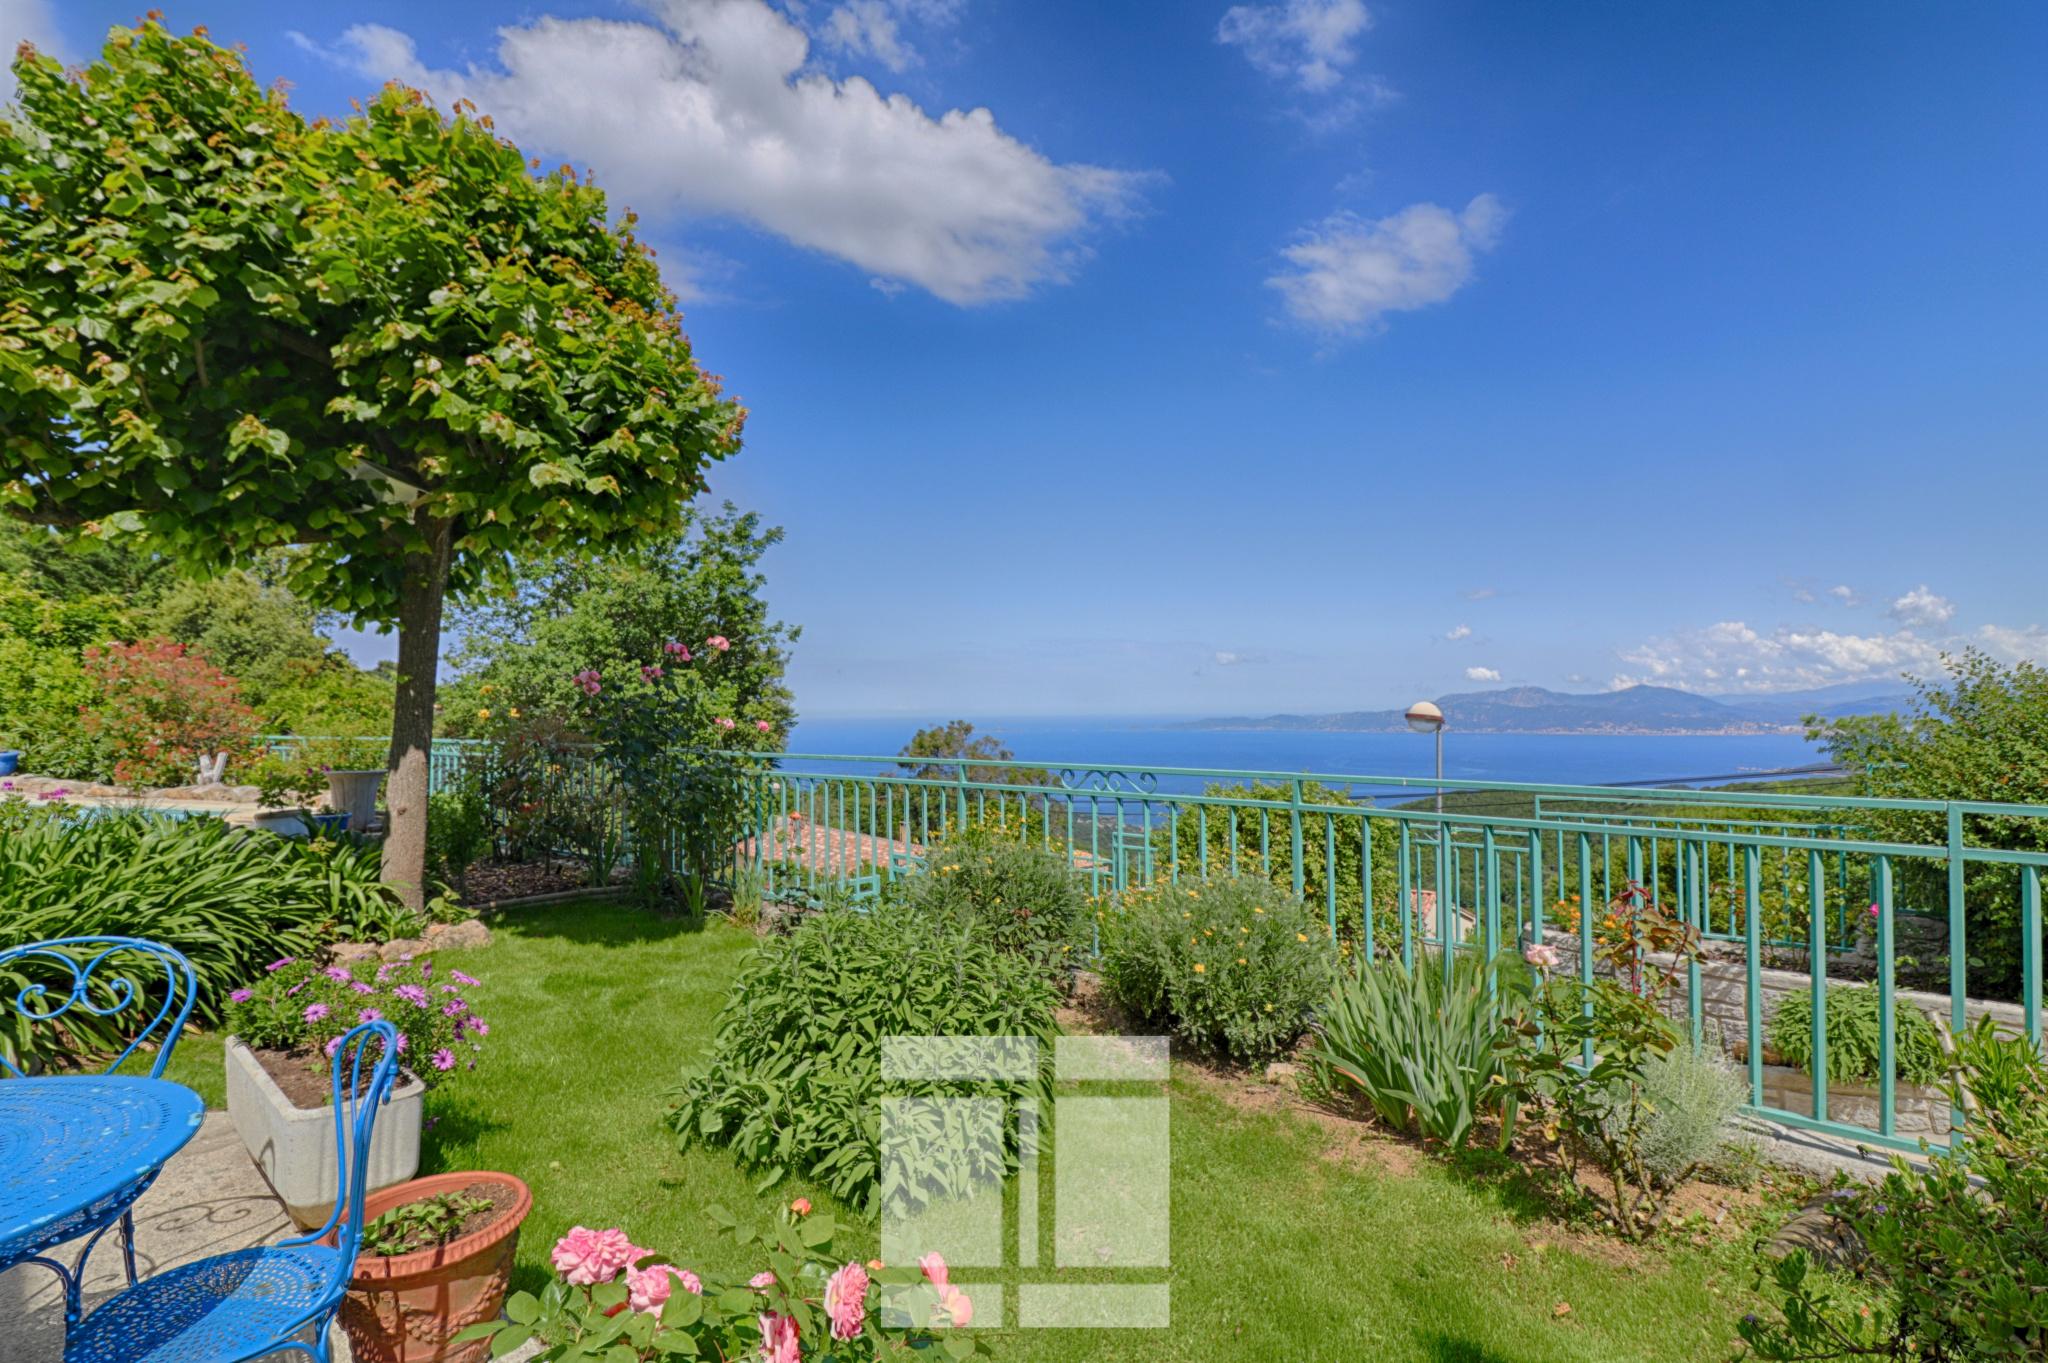 Coti-Chiavari – Villa avec piscine et splendide vue sur la mer